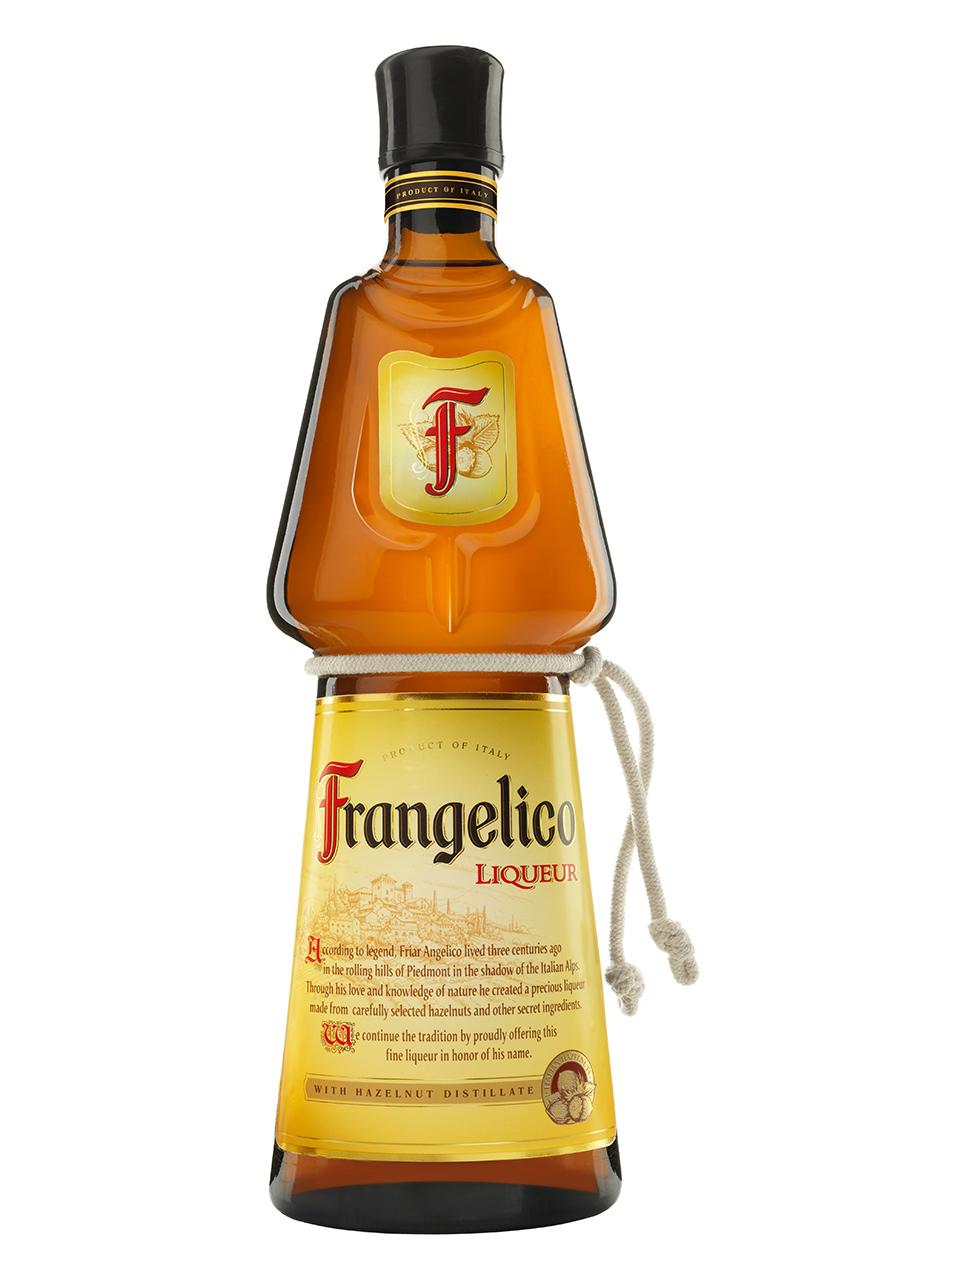 Frangelico Liqueur